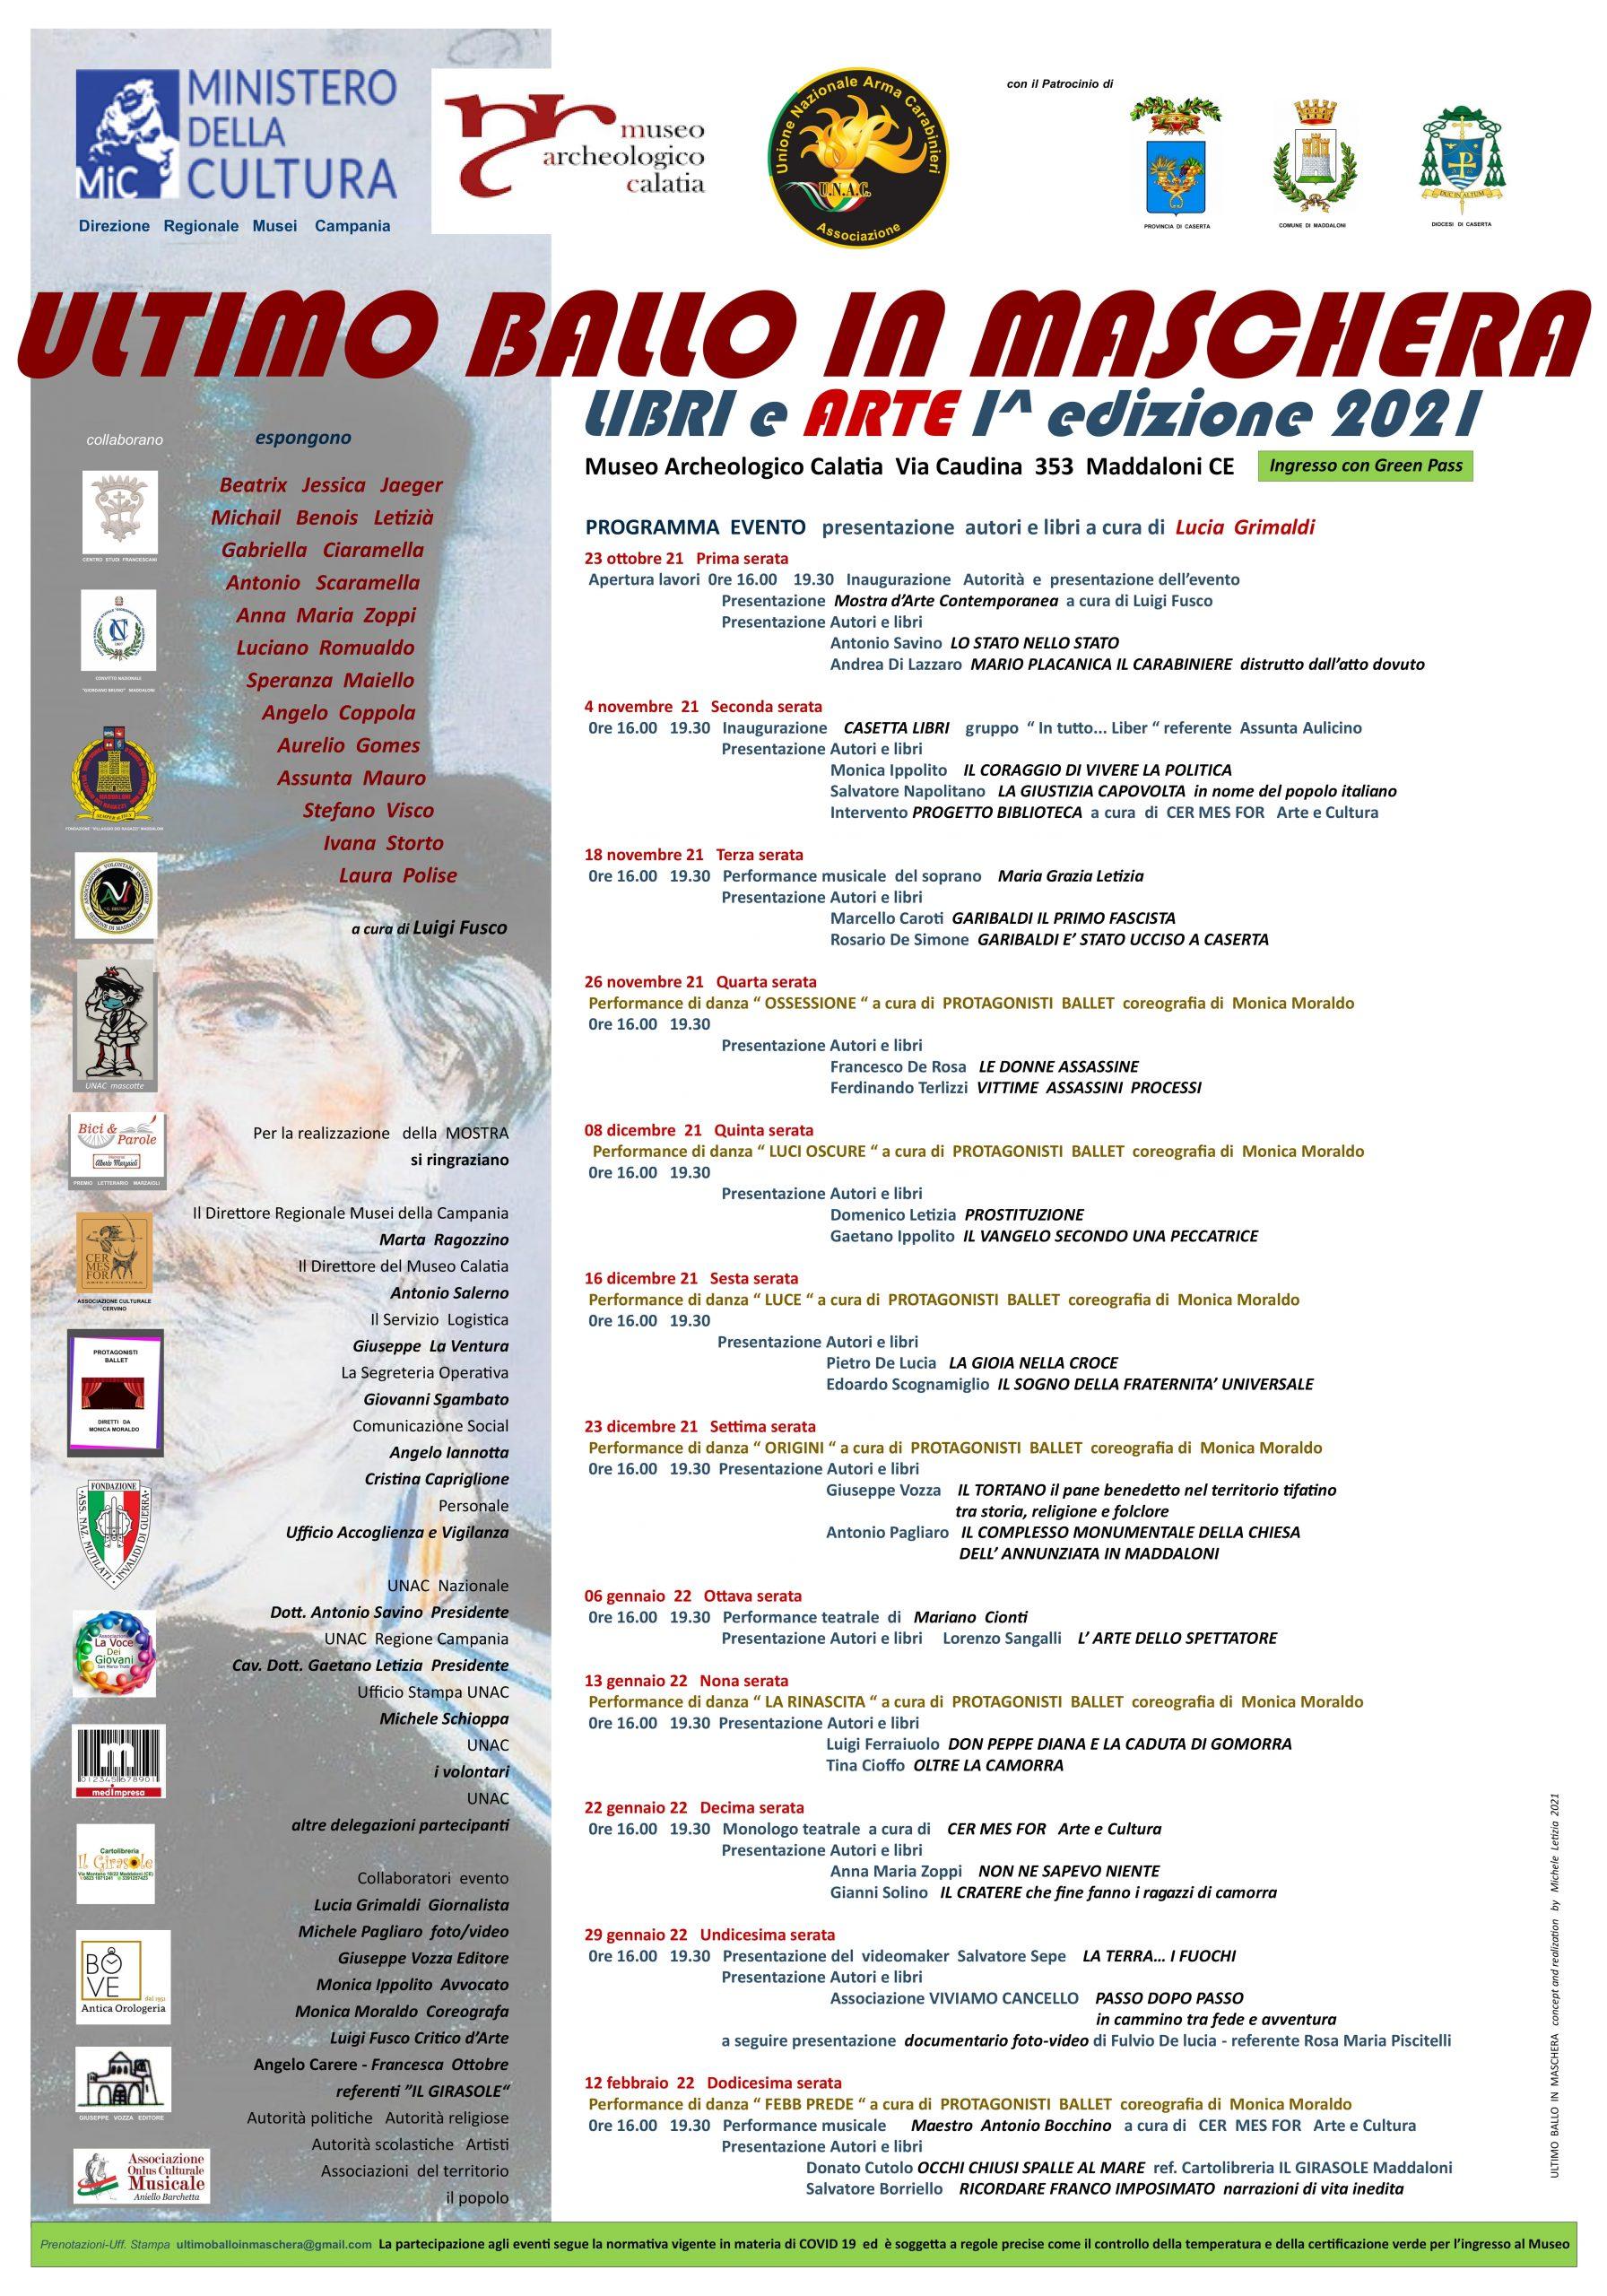 Locandina Ultimo Ballo in Maschera scaled ULTIMO BALLO IN MASCHERA: LIBRI E ARTE AL MUSEO ARCHEOLOGICO CALATIA